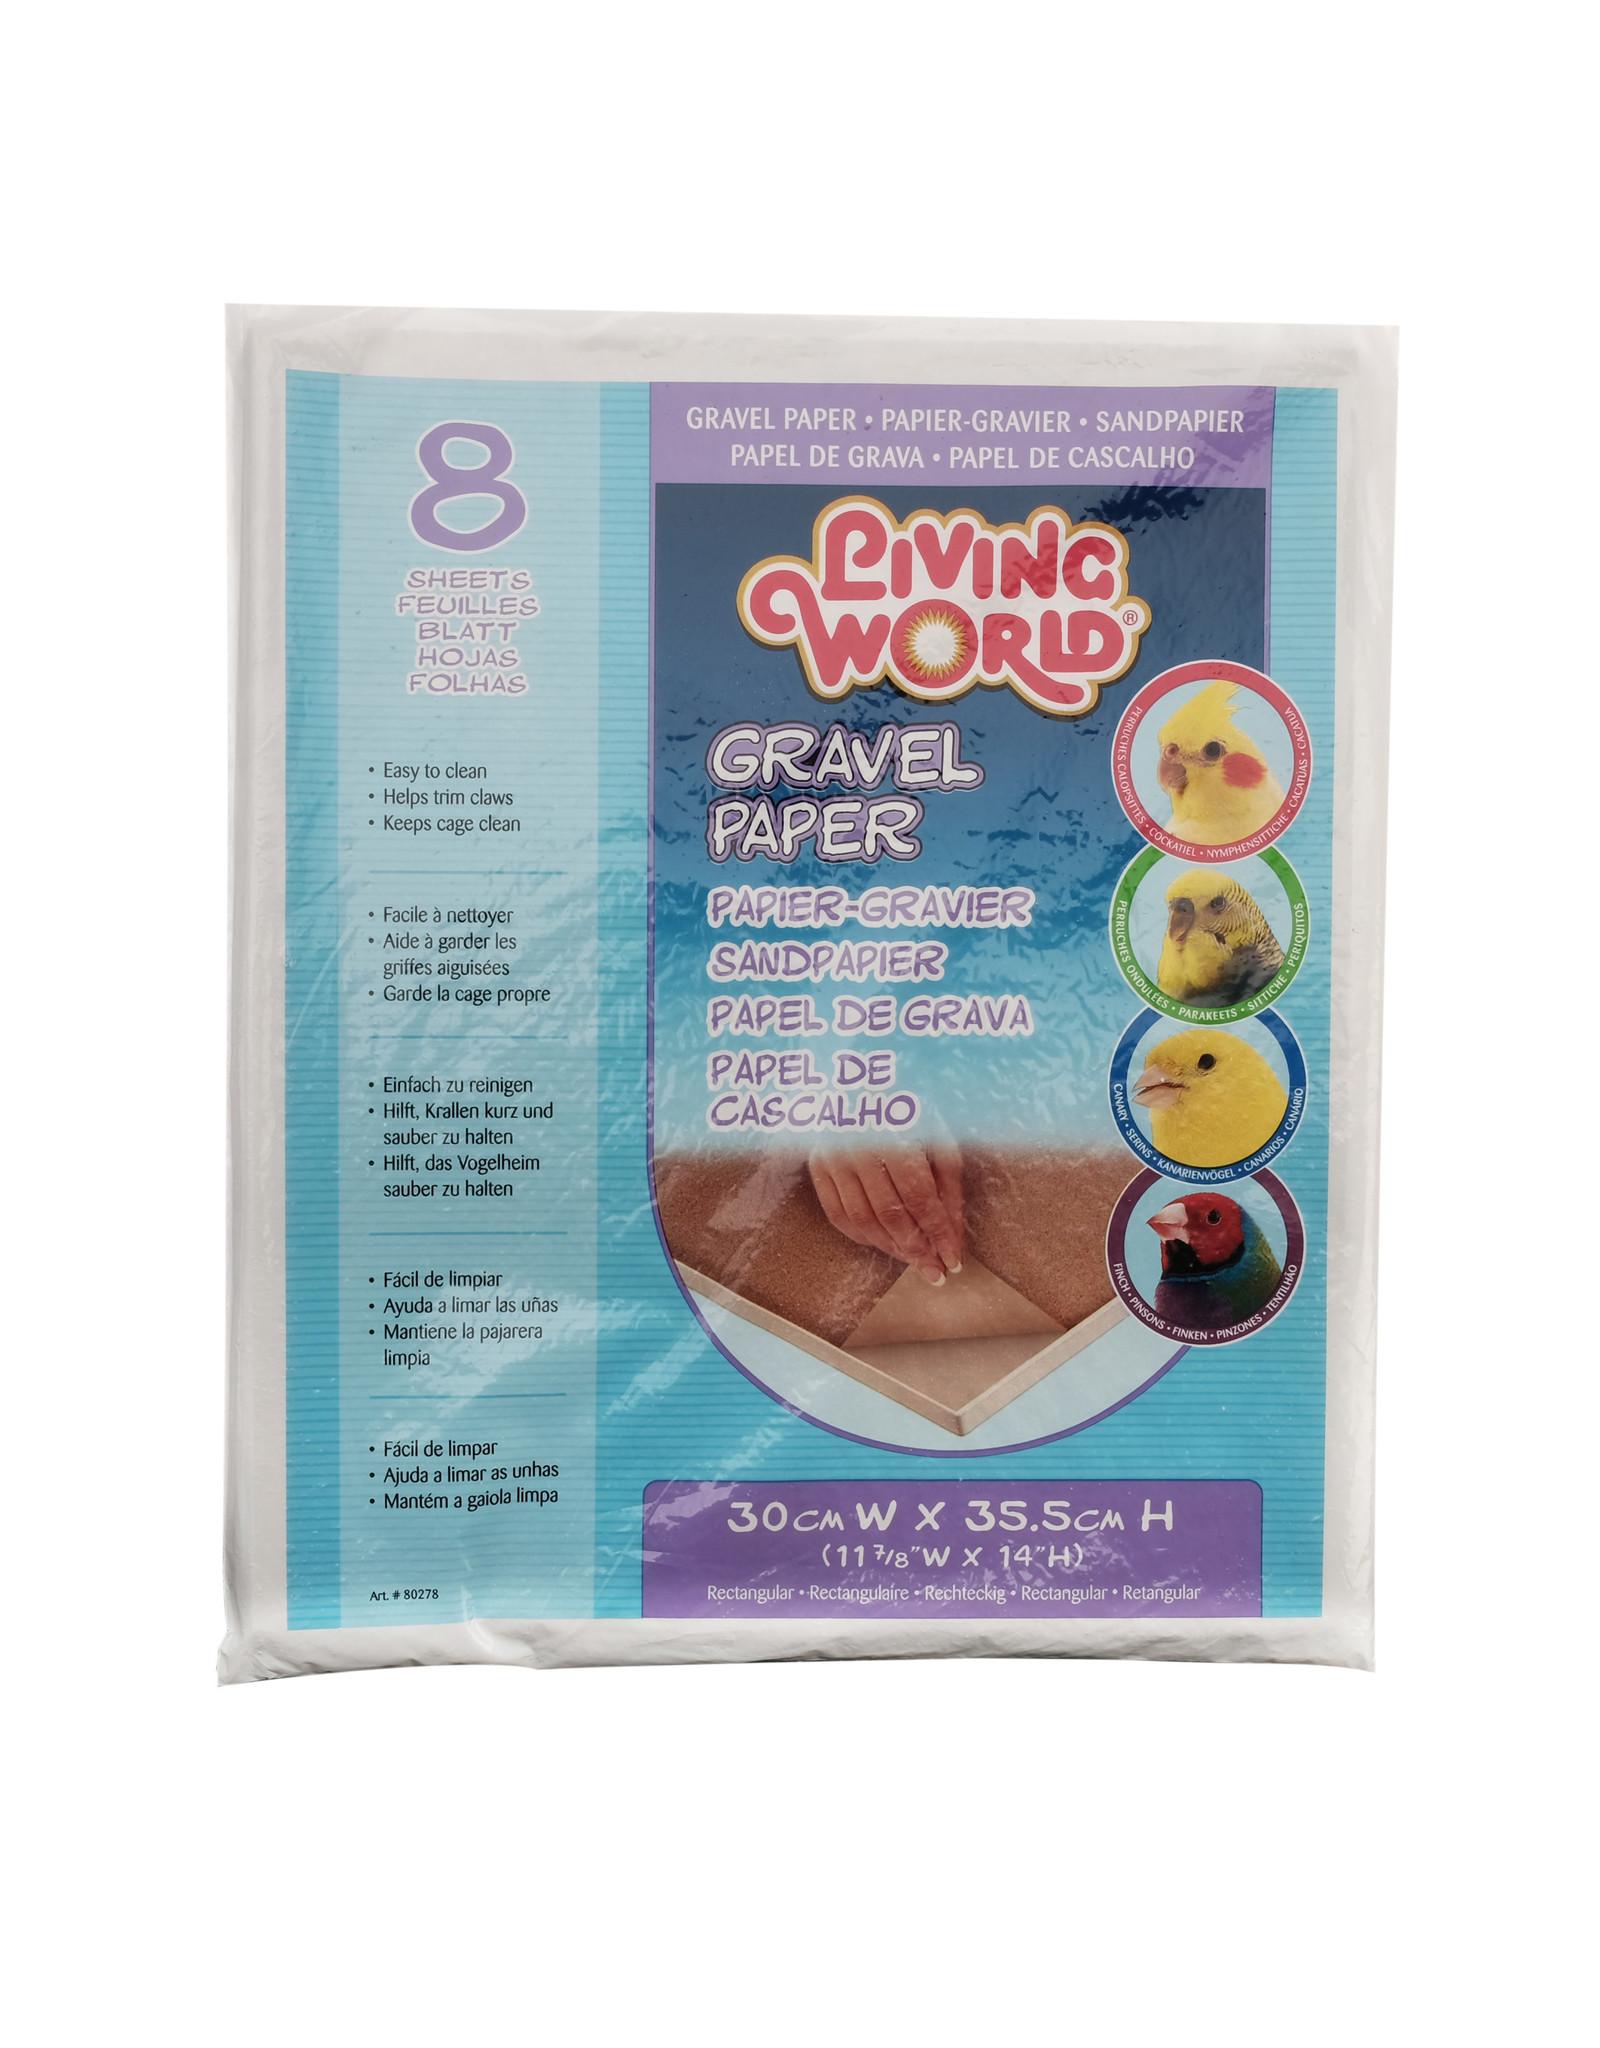 Living World Gravel Paper - Small - 8 pack - 30 cm x 35.5 cm (12 x 14 in)